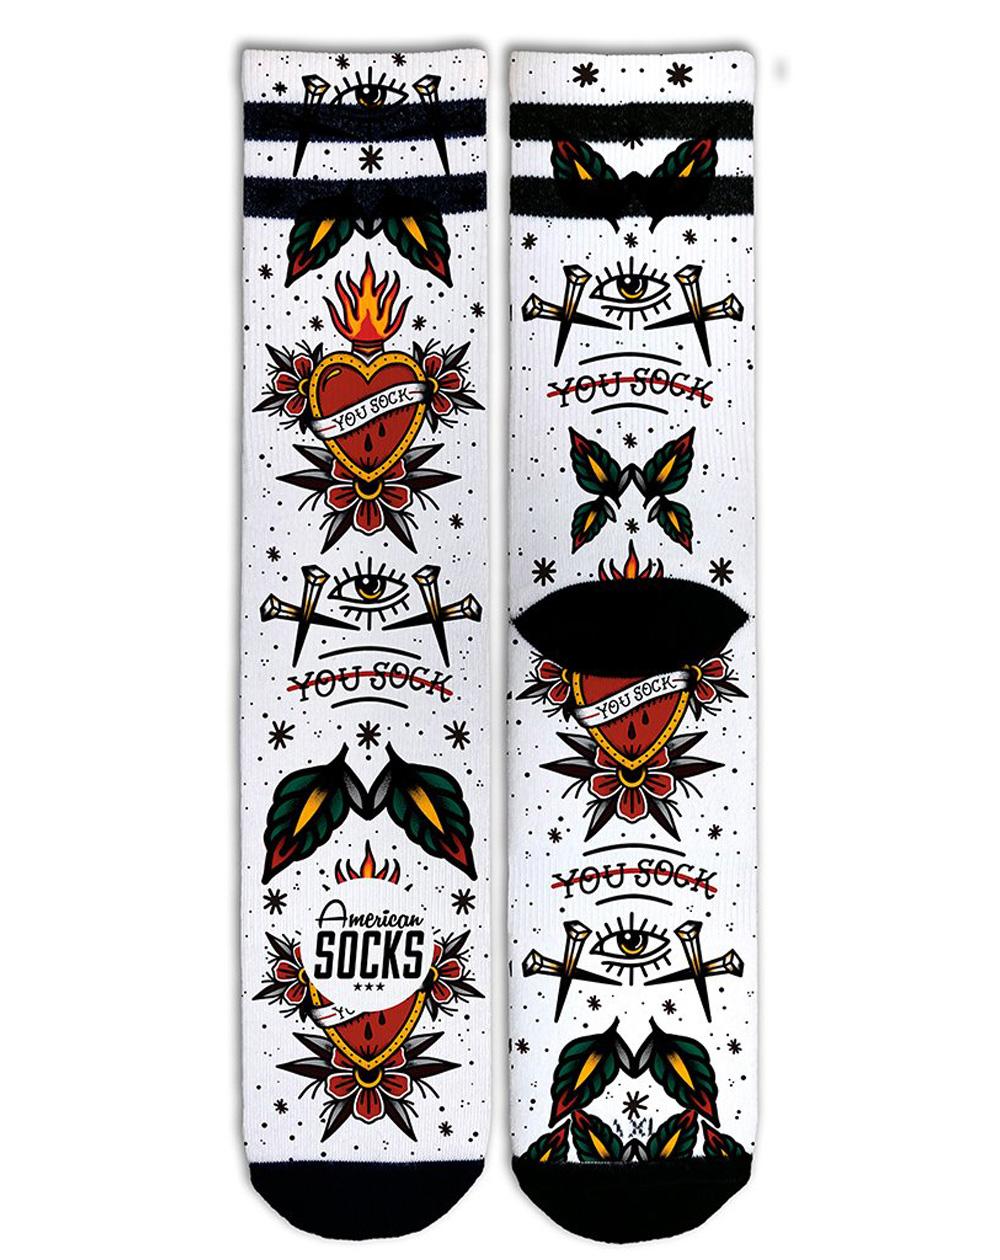 American Socks Unisex Adults Socks You Sock